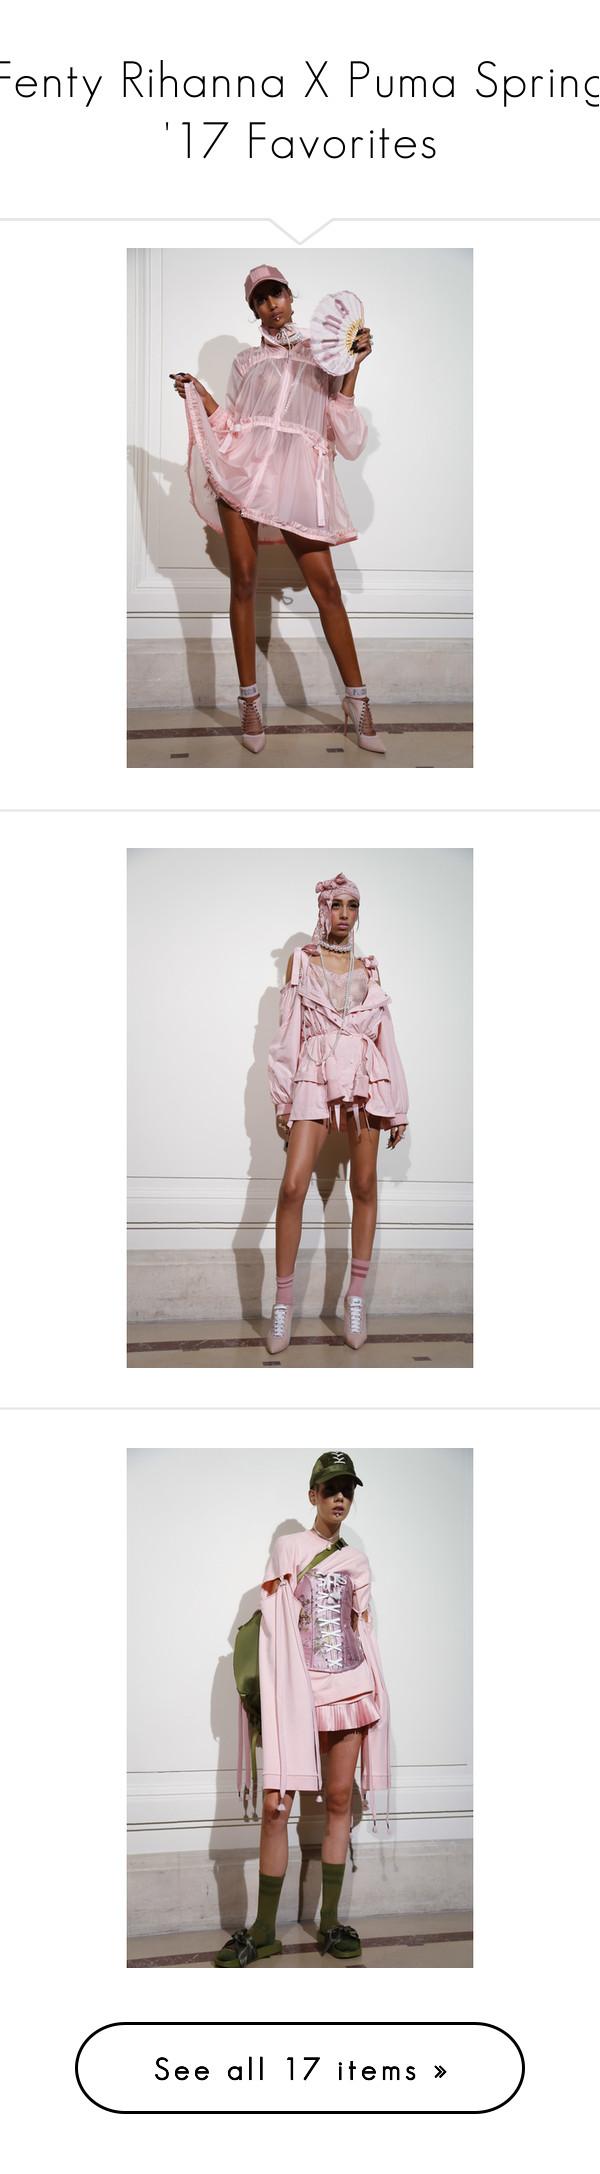 """Fenty Rihanna X Puma Spring '17 Favorites"" by amberelb ❤ liked on Polyvore"